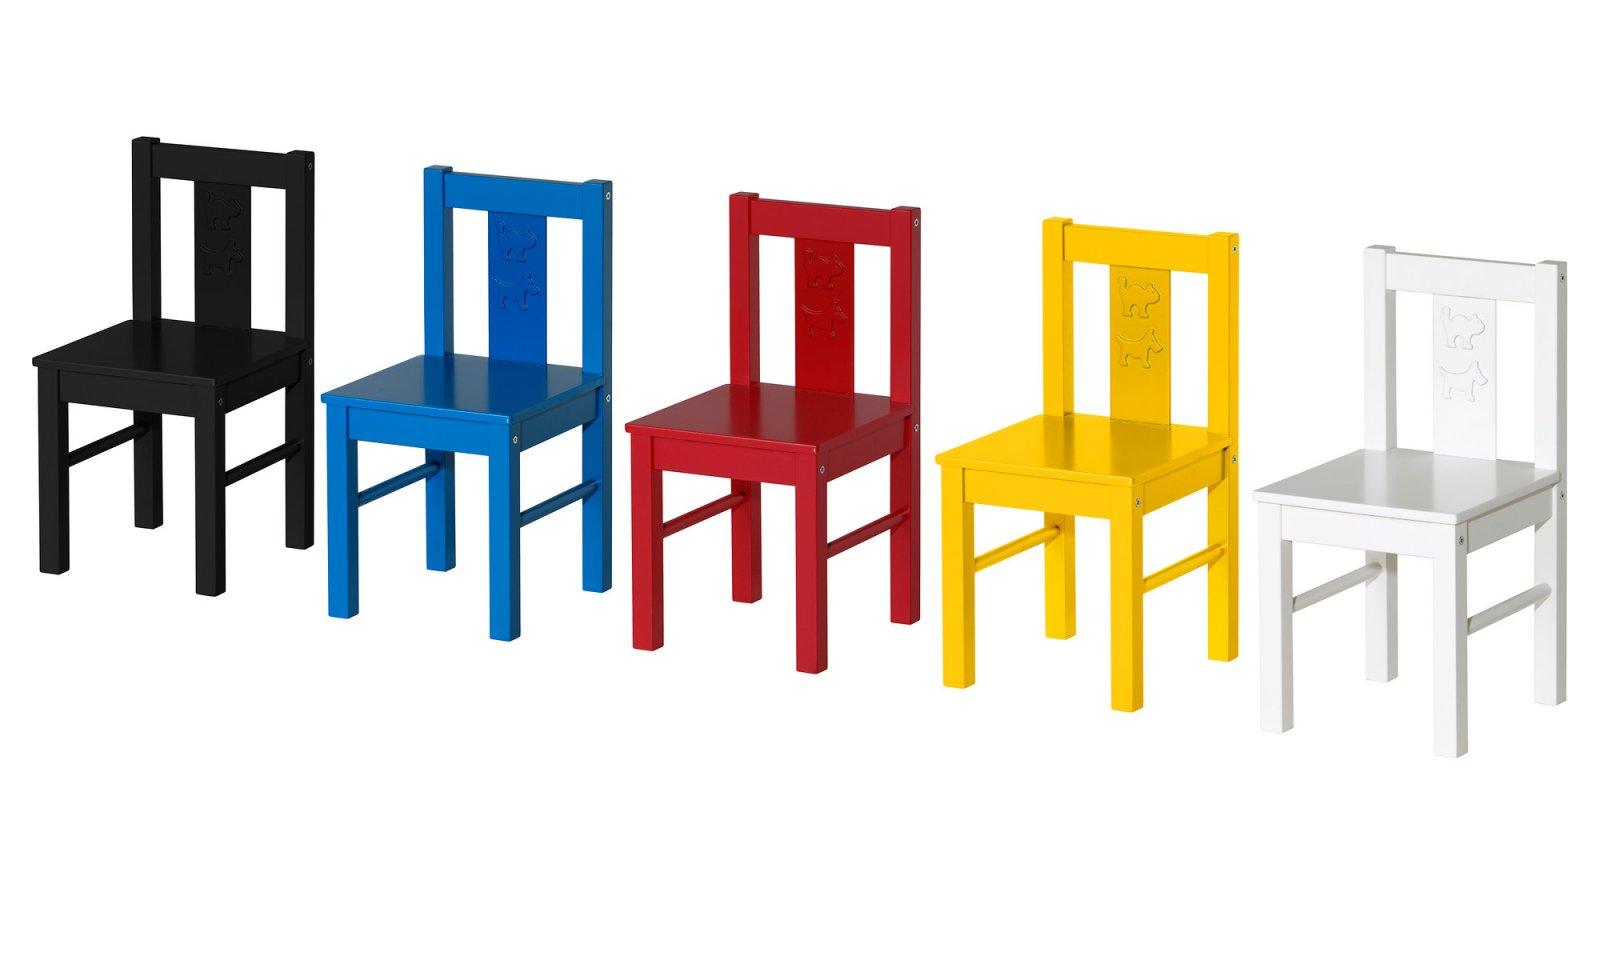 Mobiliario para ni os kritter de ikea decoraci n del hogar for Muebles infantiles ikea